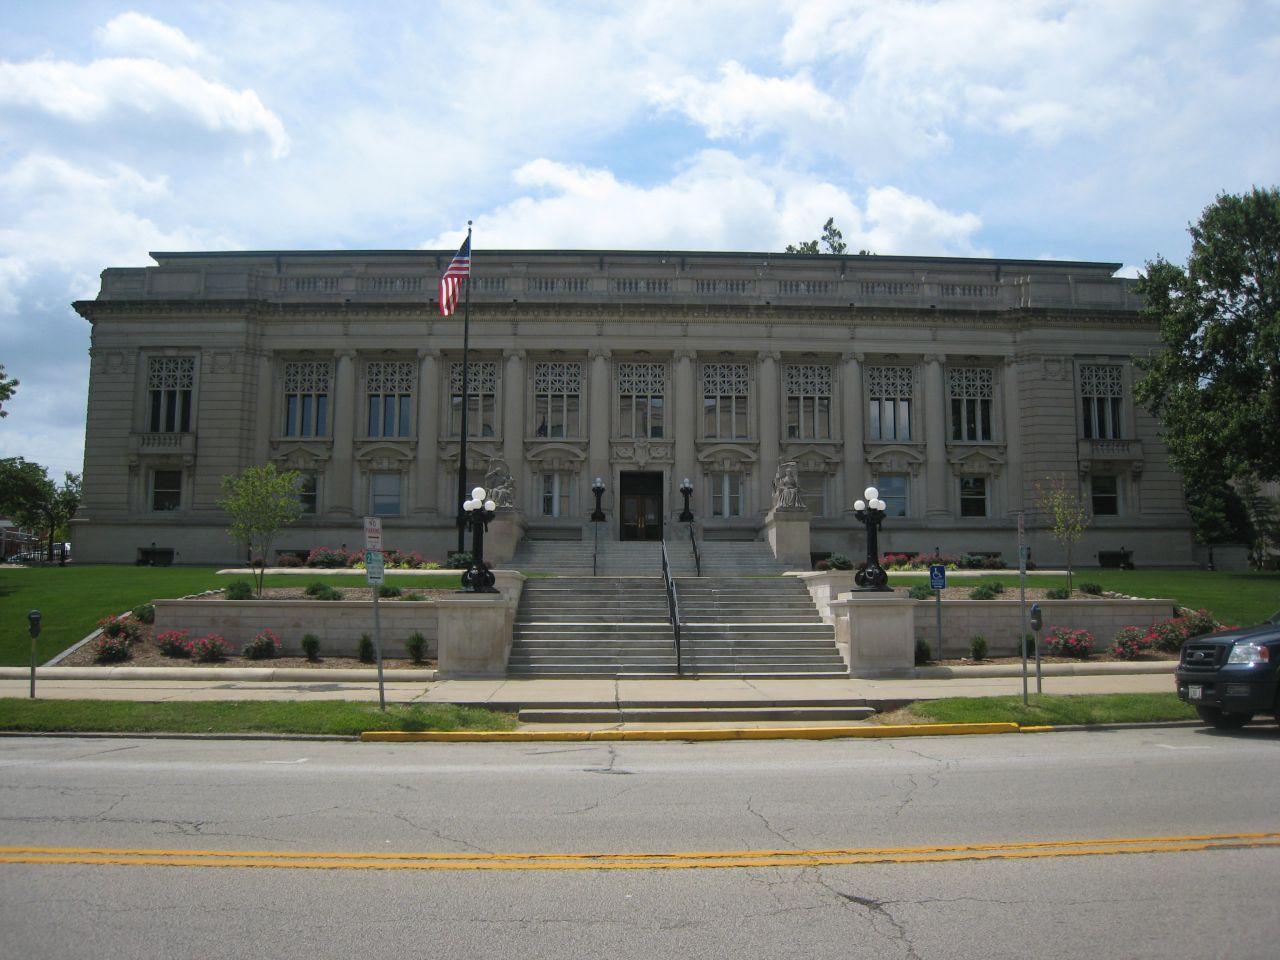 The Illinois Supreme Court building at 200 E. Capitol Ave., Springfield